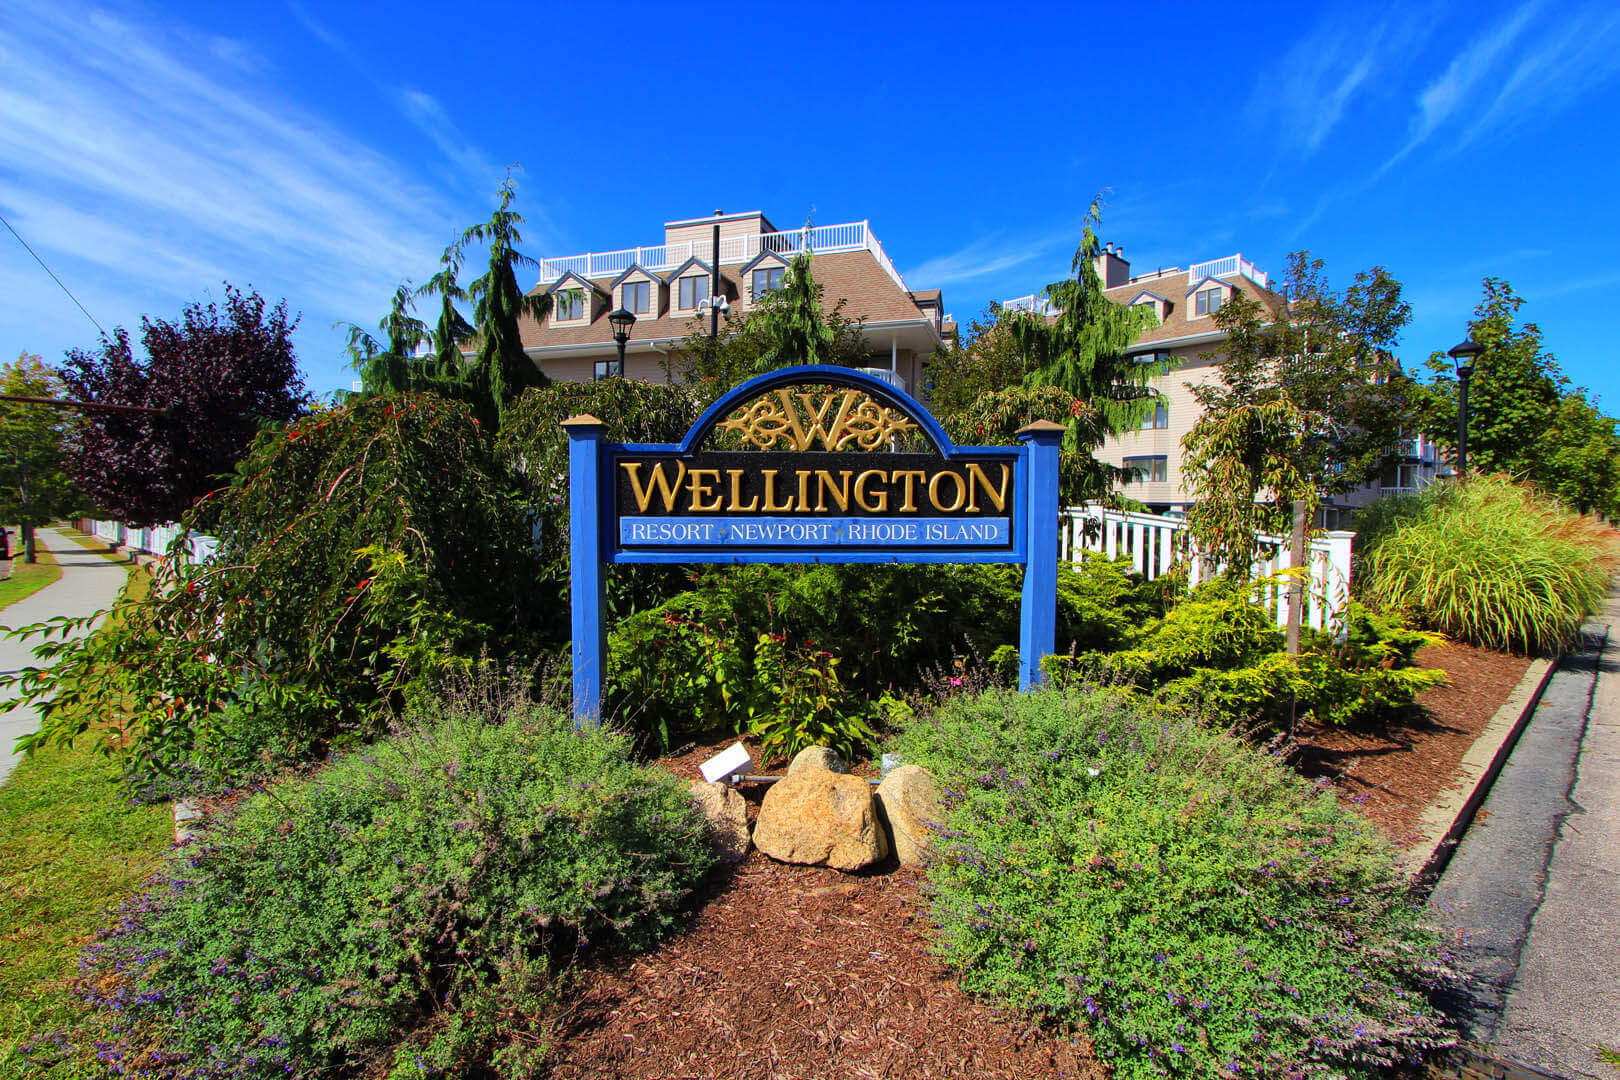 Wellington Resort Signage